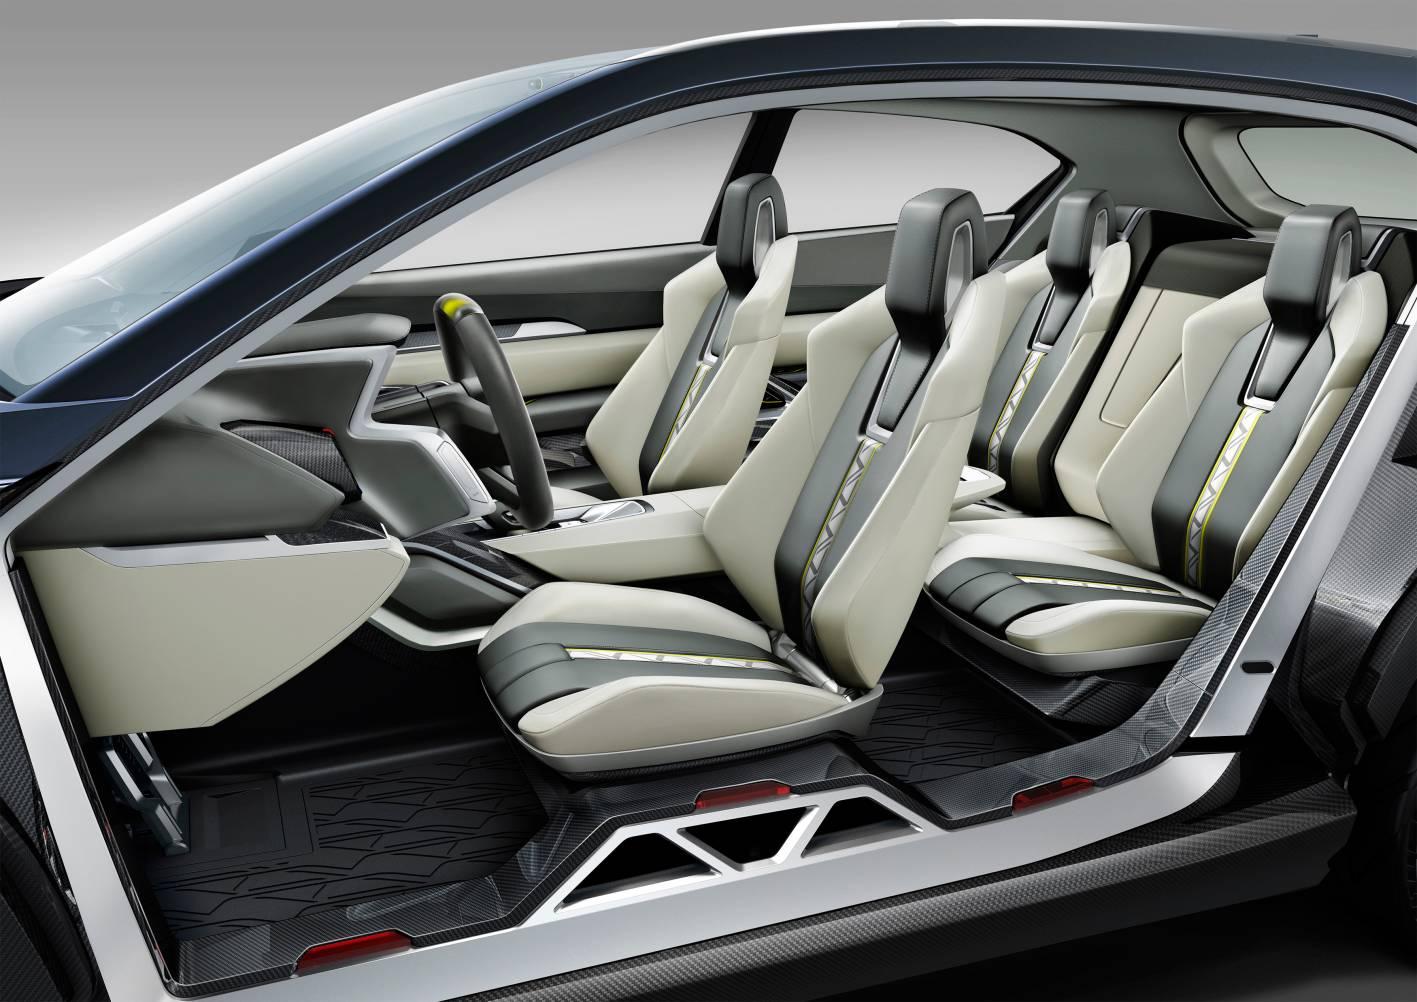 Subaru Cars - News: VIZIV 2 concept previews future drivetrain